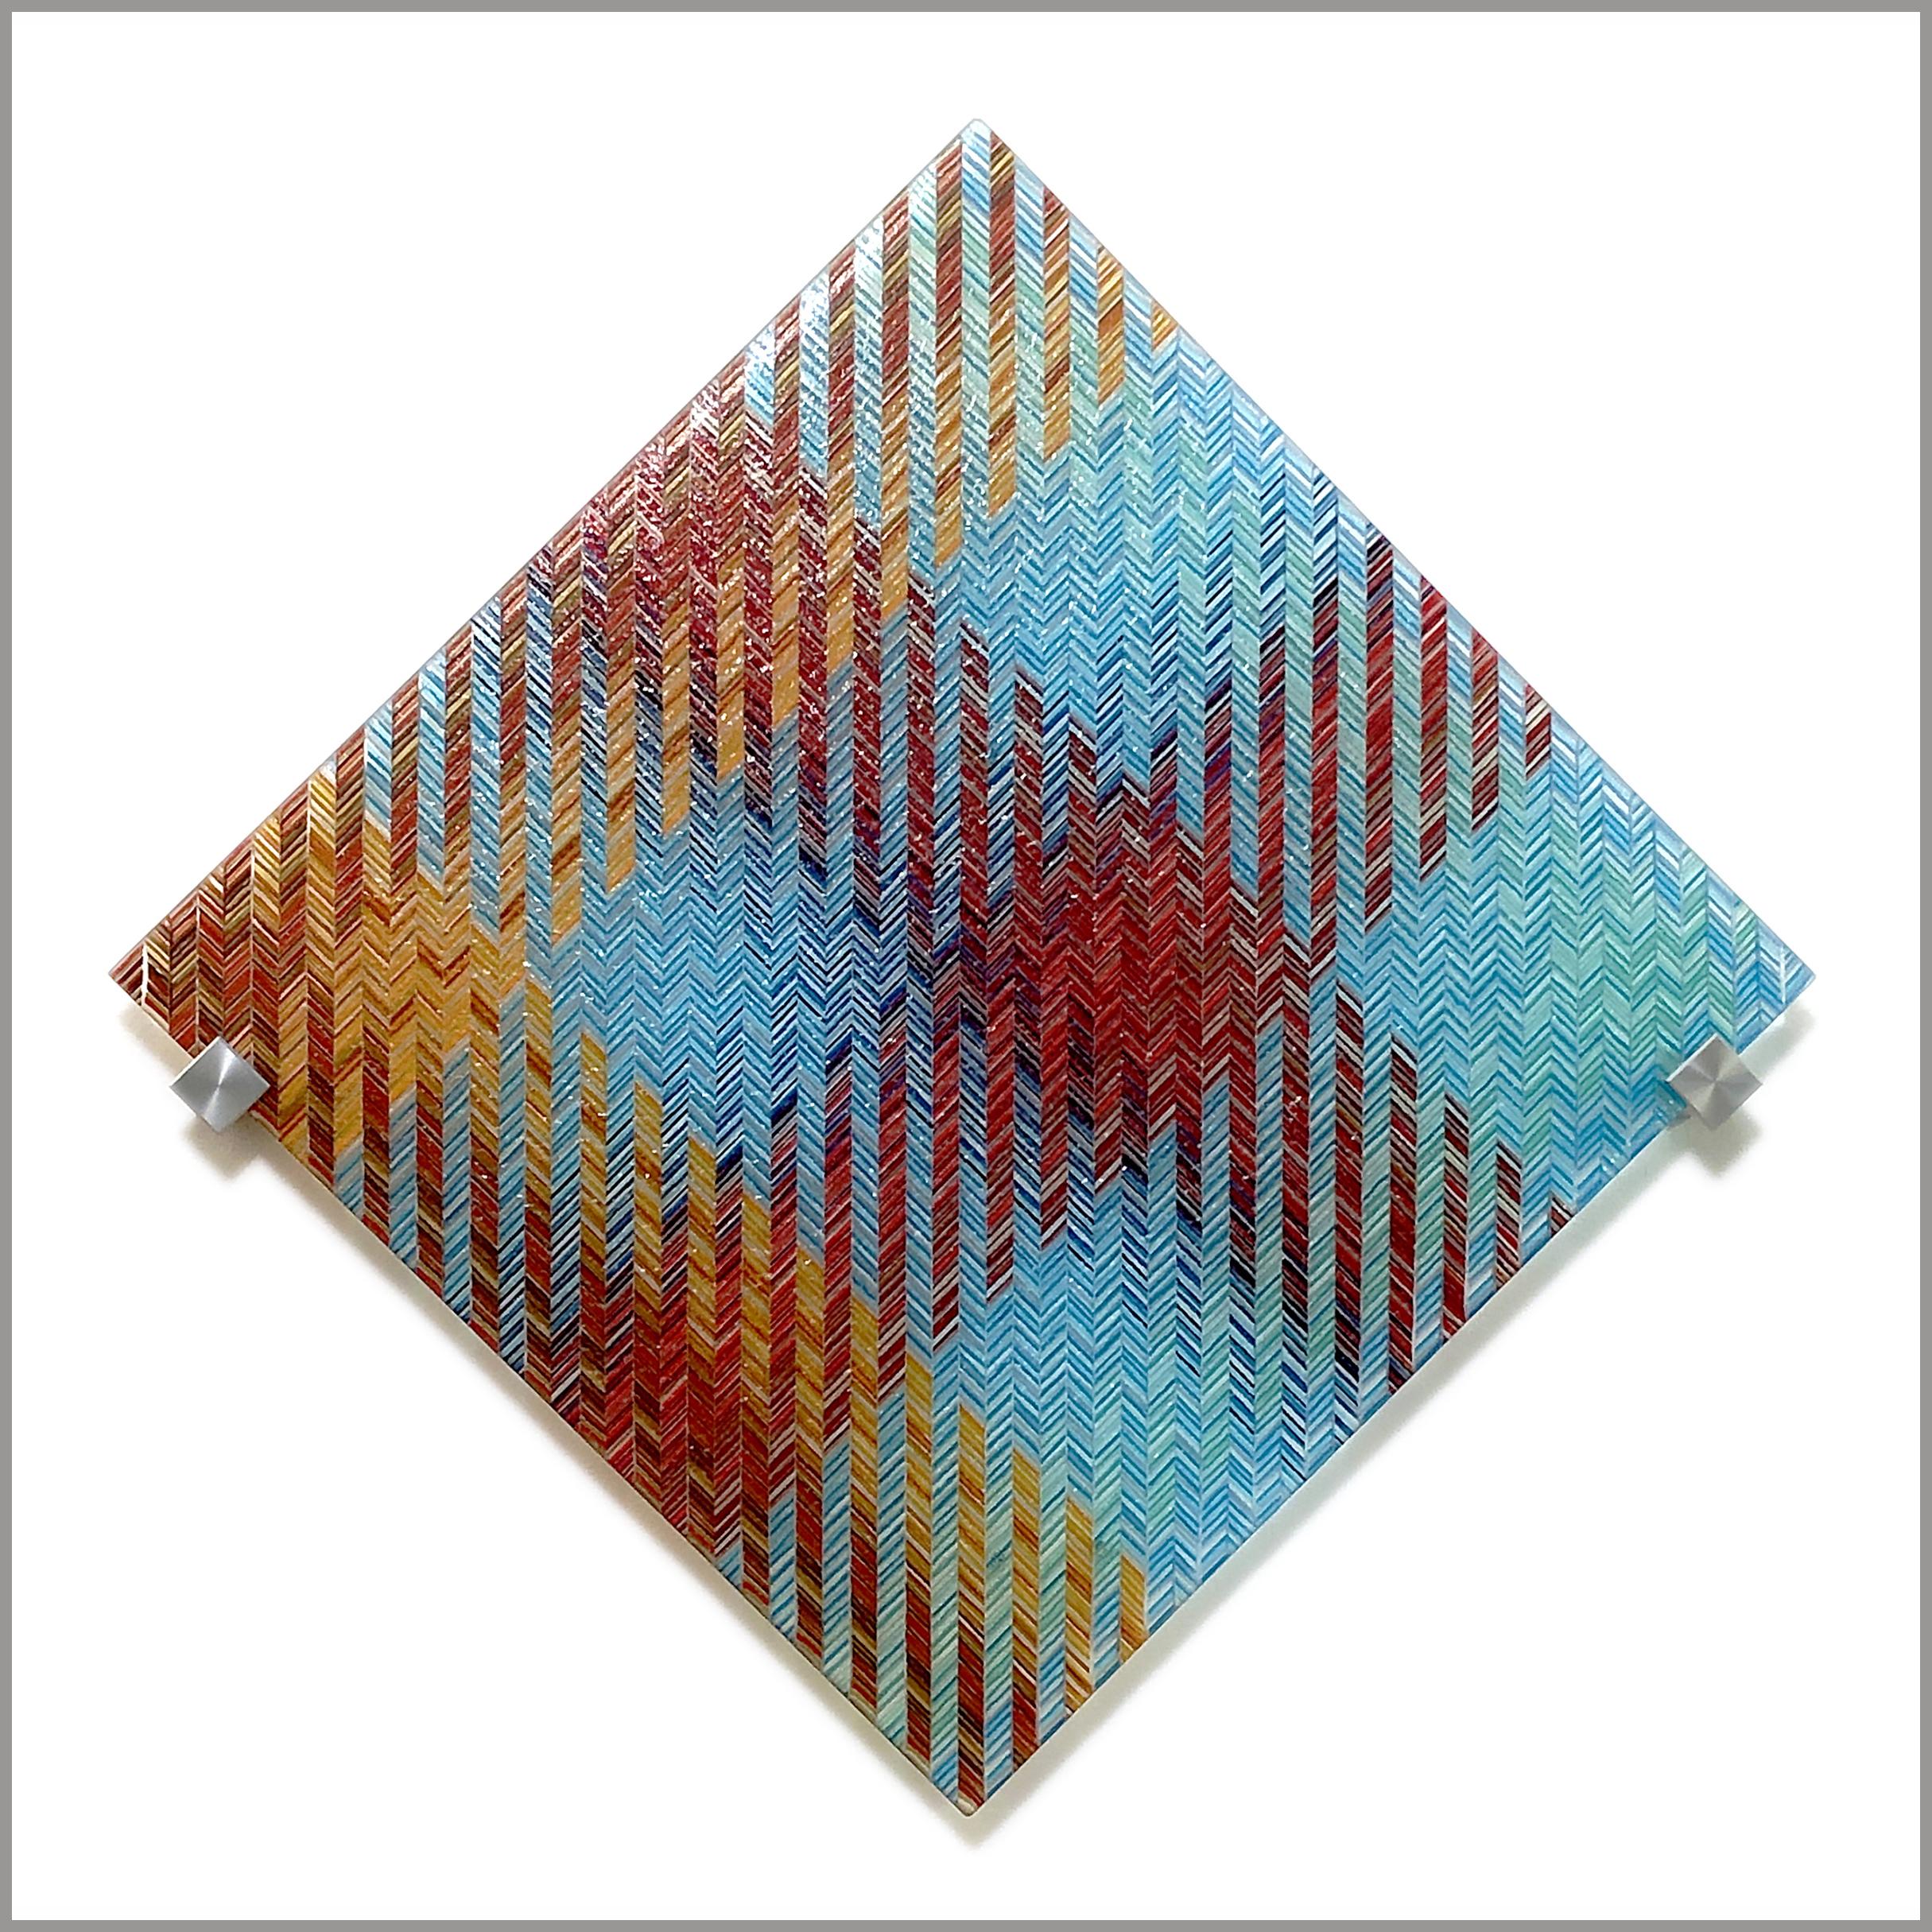 Tapestry 78